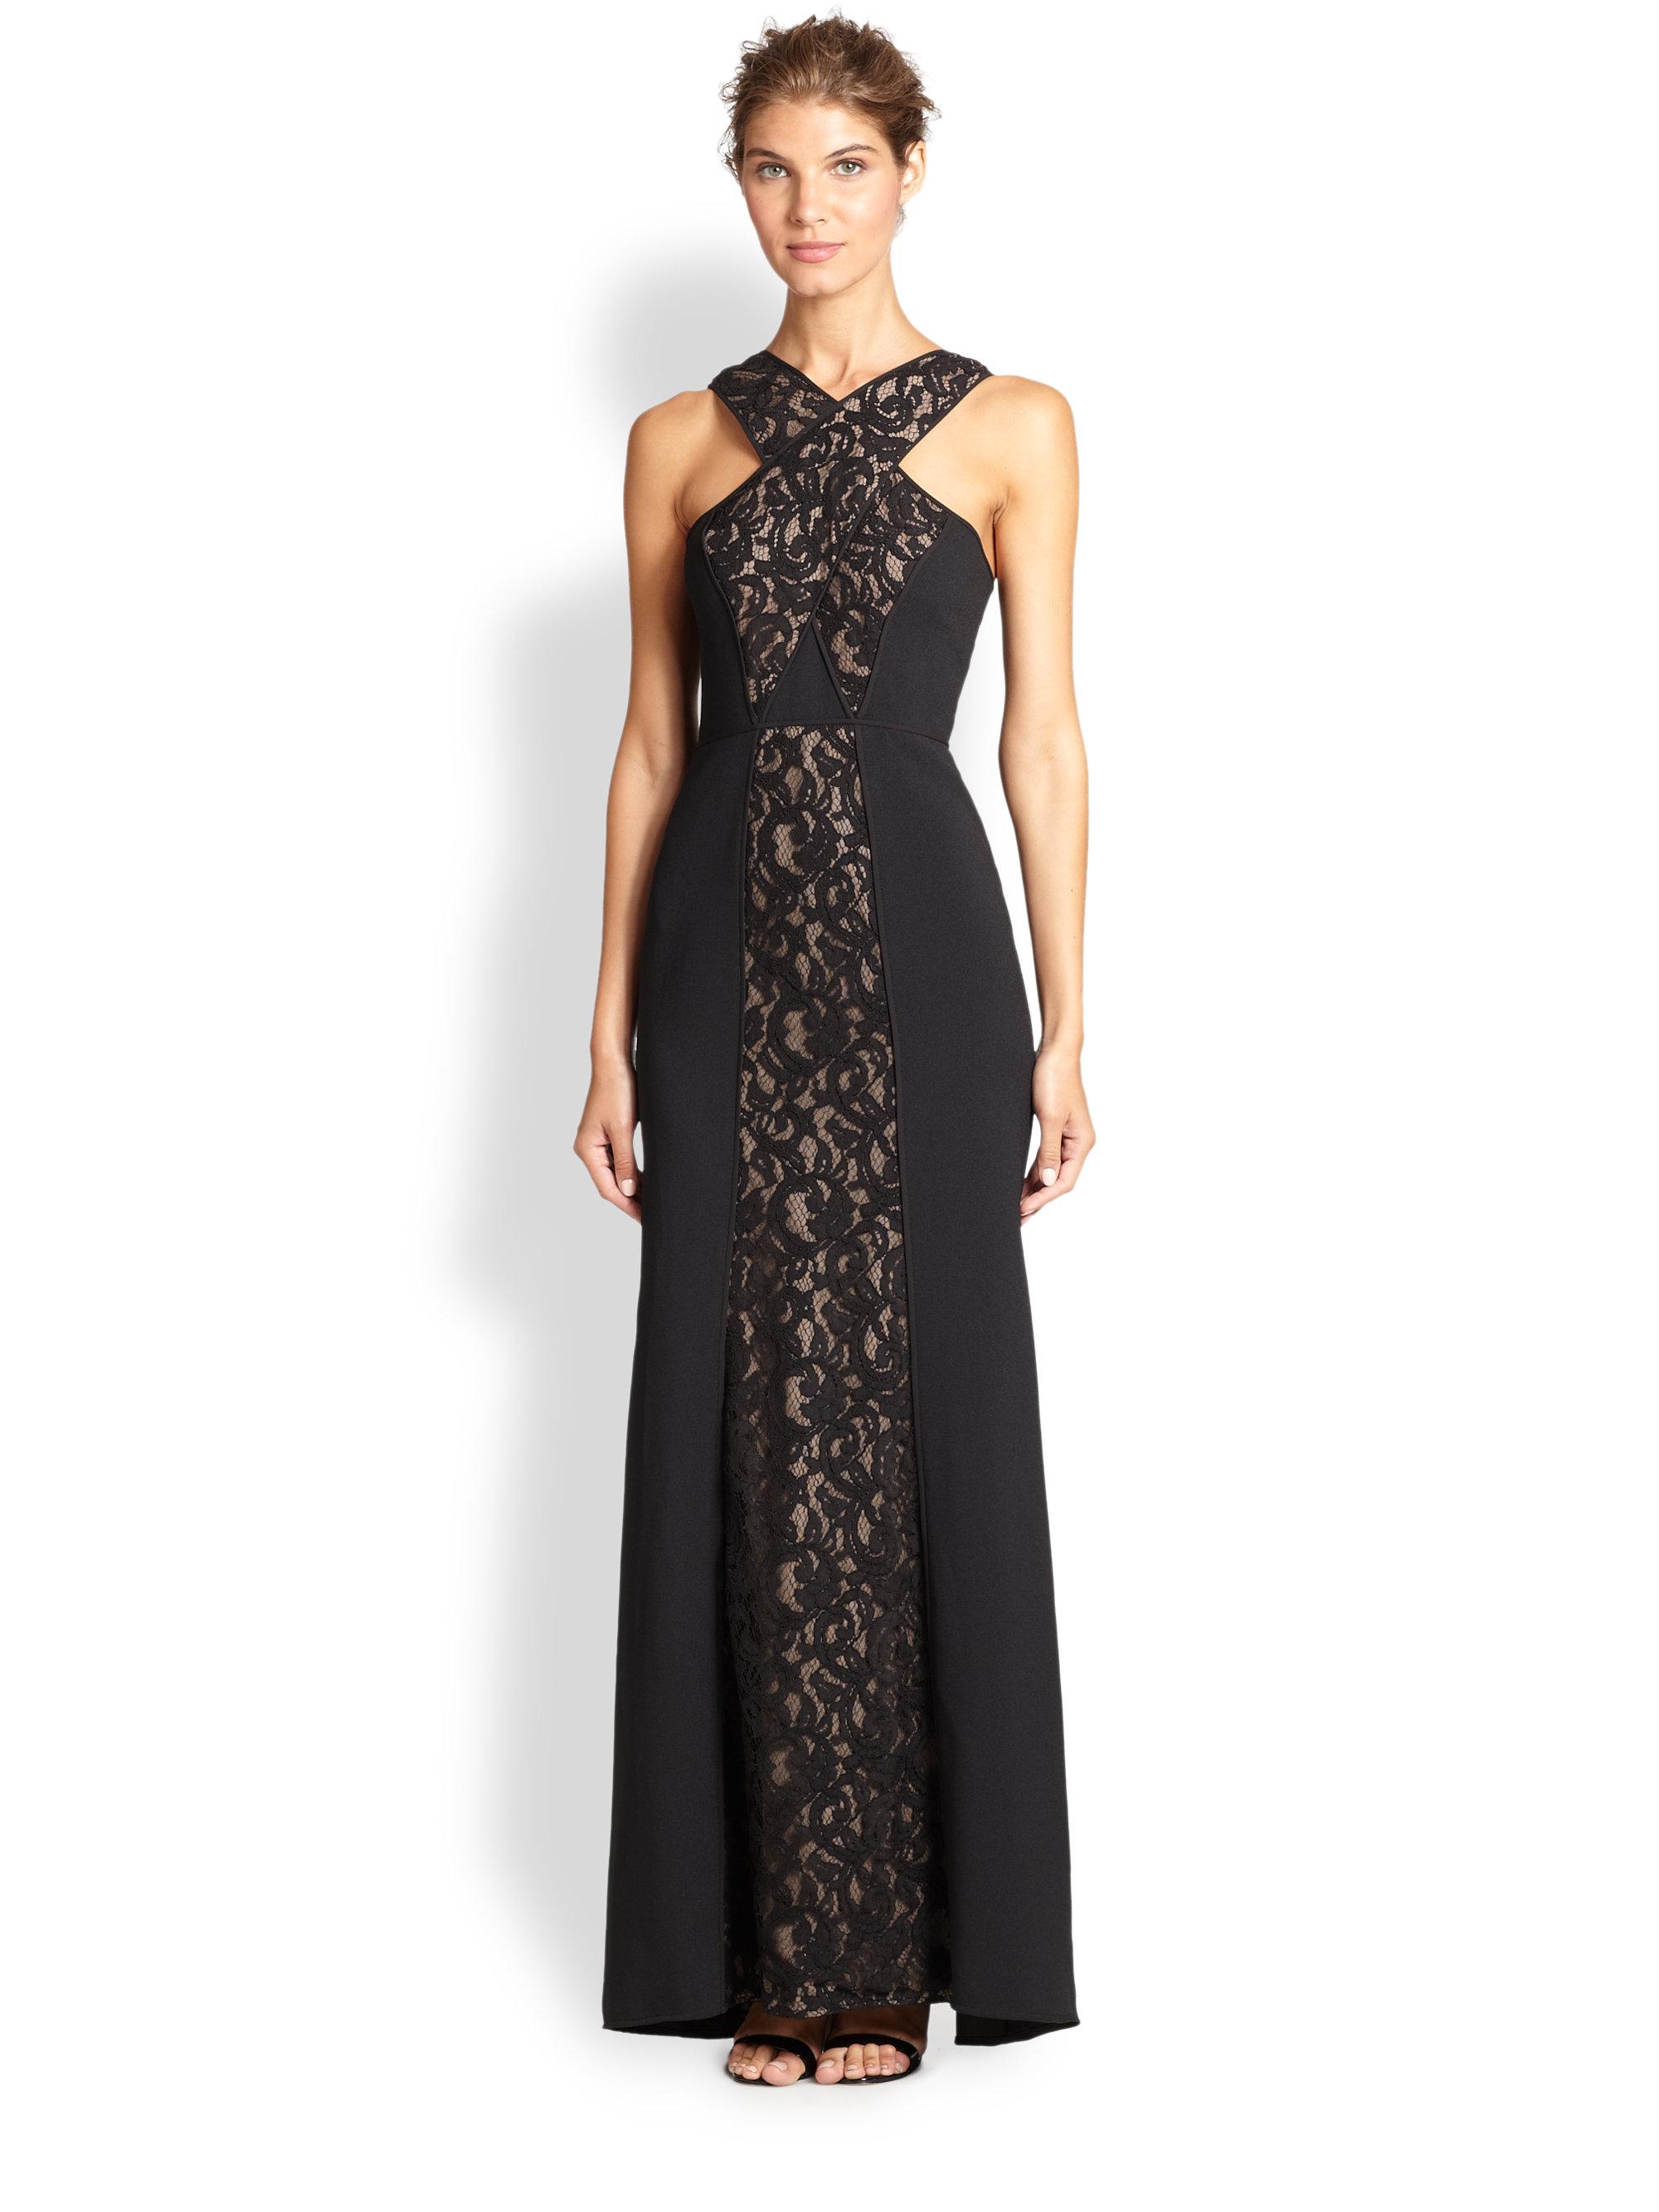 Lyst - Bcbgmaxazria Lacepaneled Halter Gown in Black